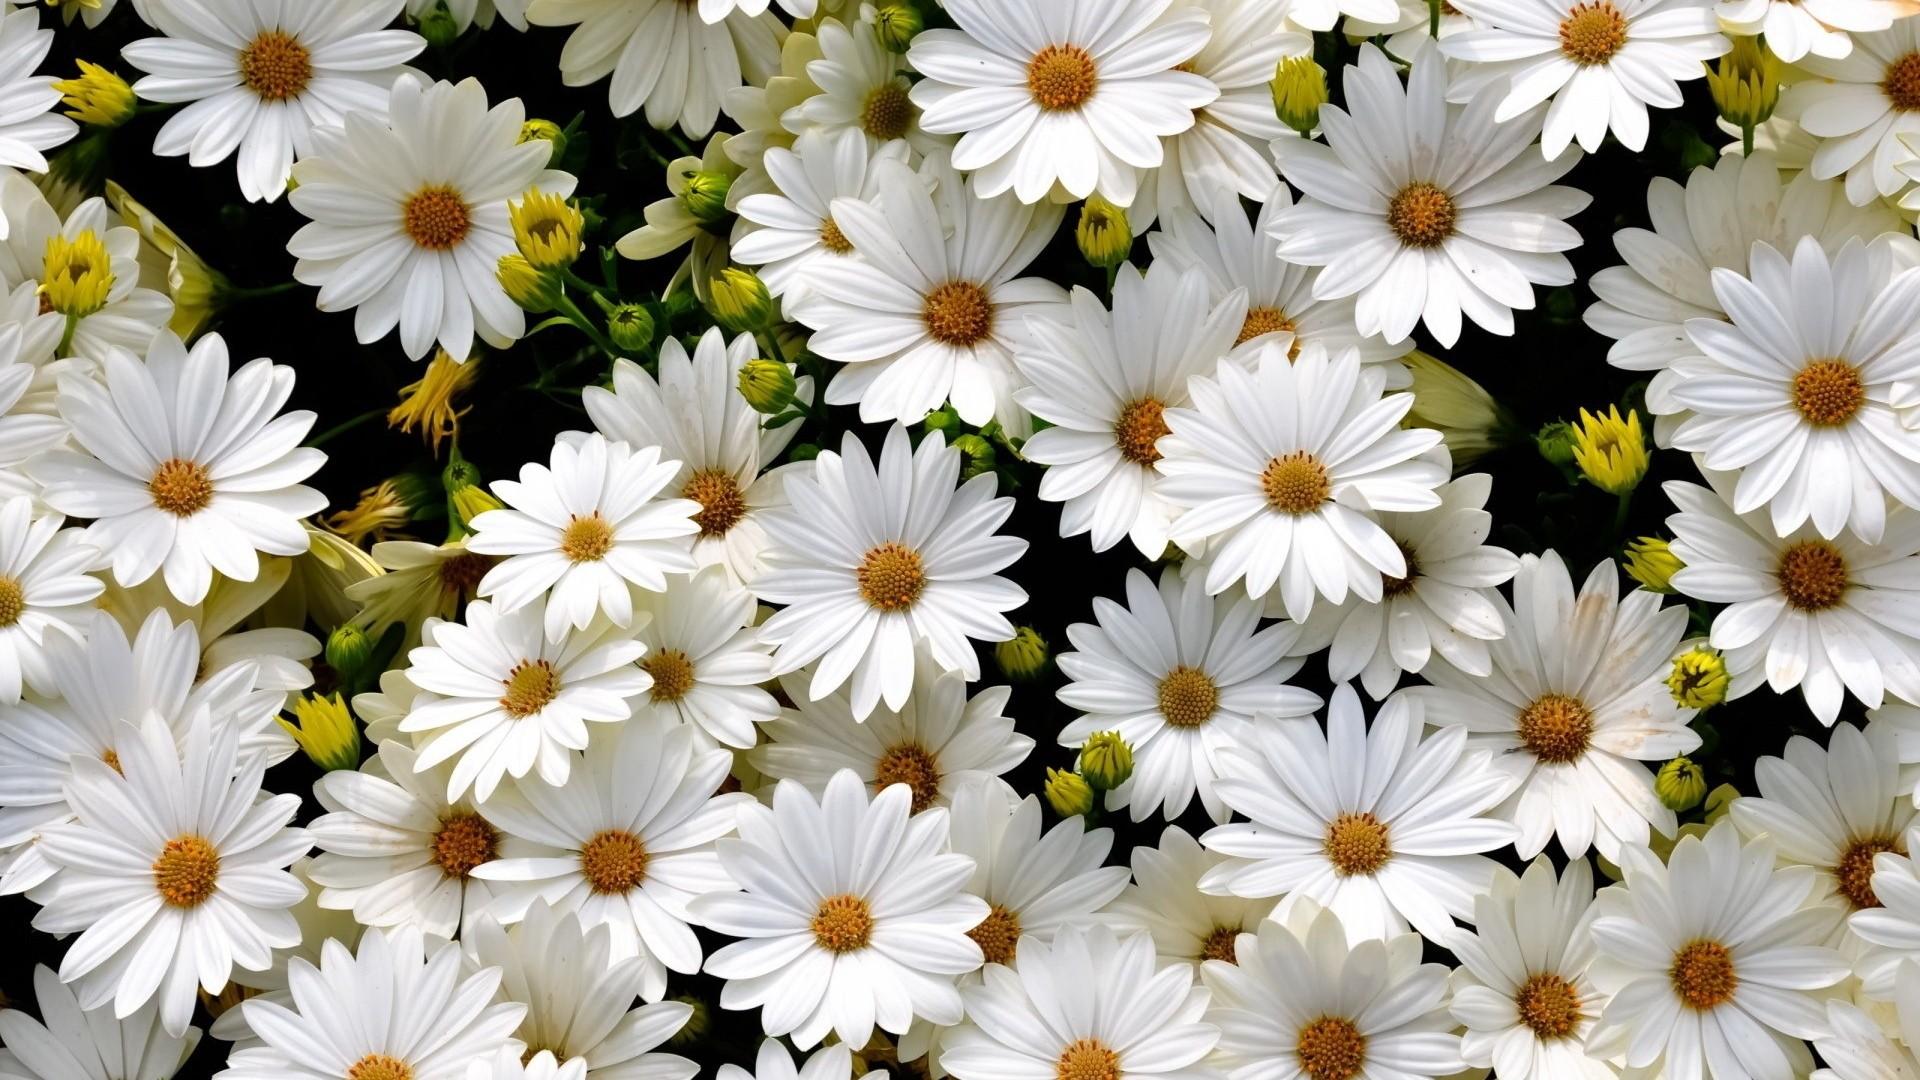 White Flower wallpaper photo hd